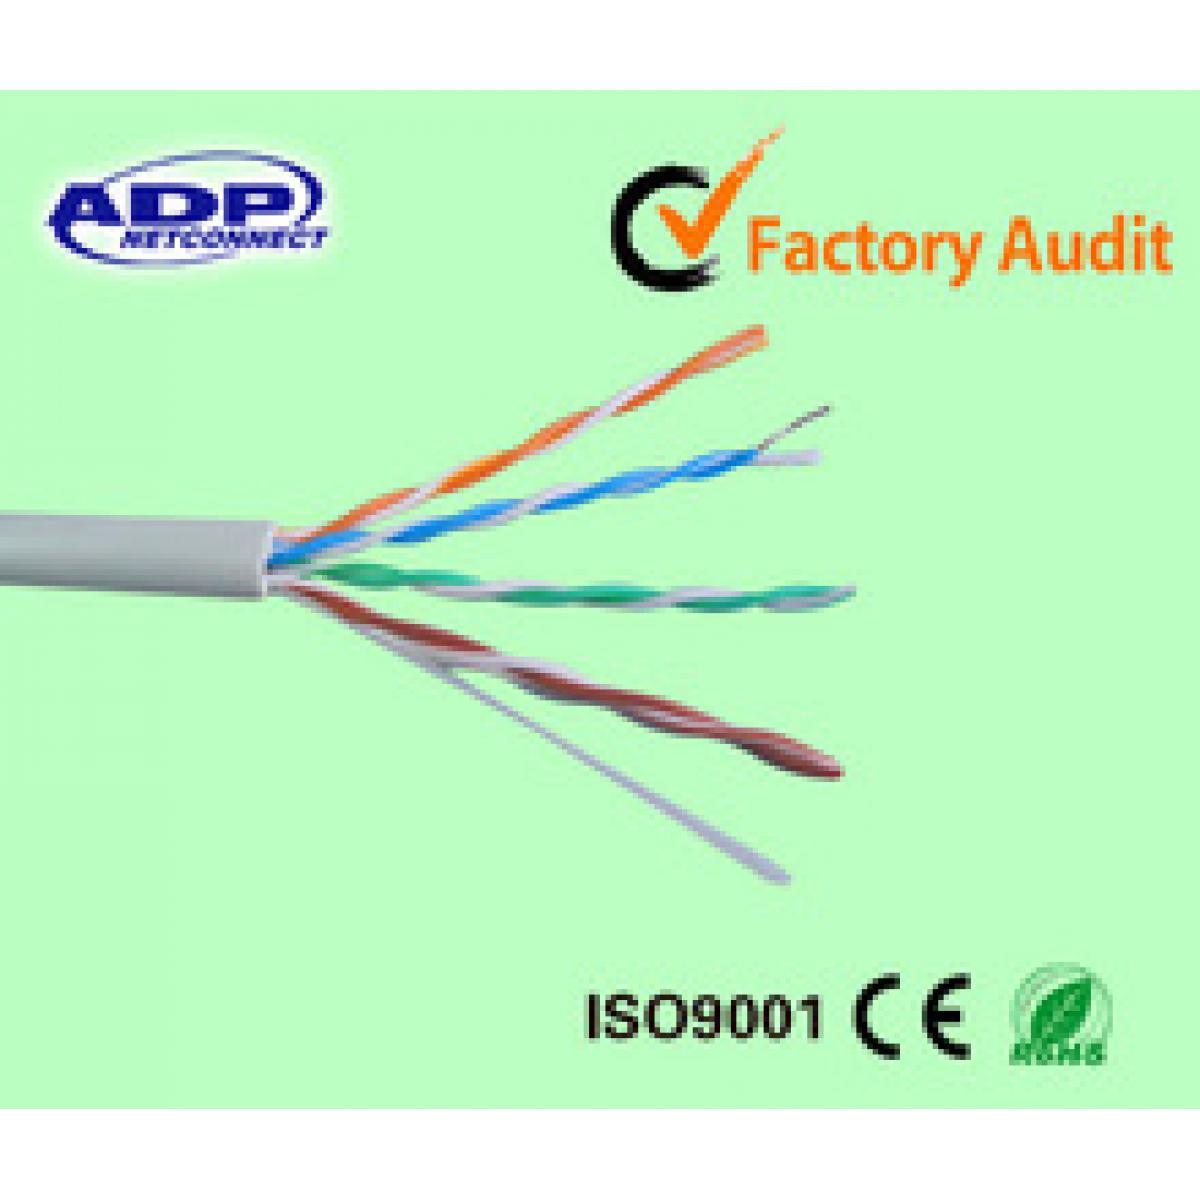 Adp Cat 5 Internet Cable 300meter Wiring 300 Meter